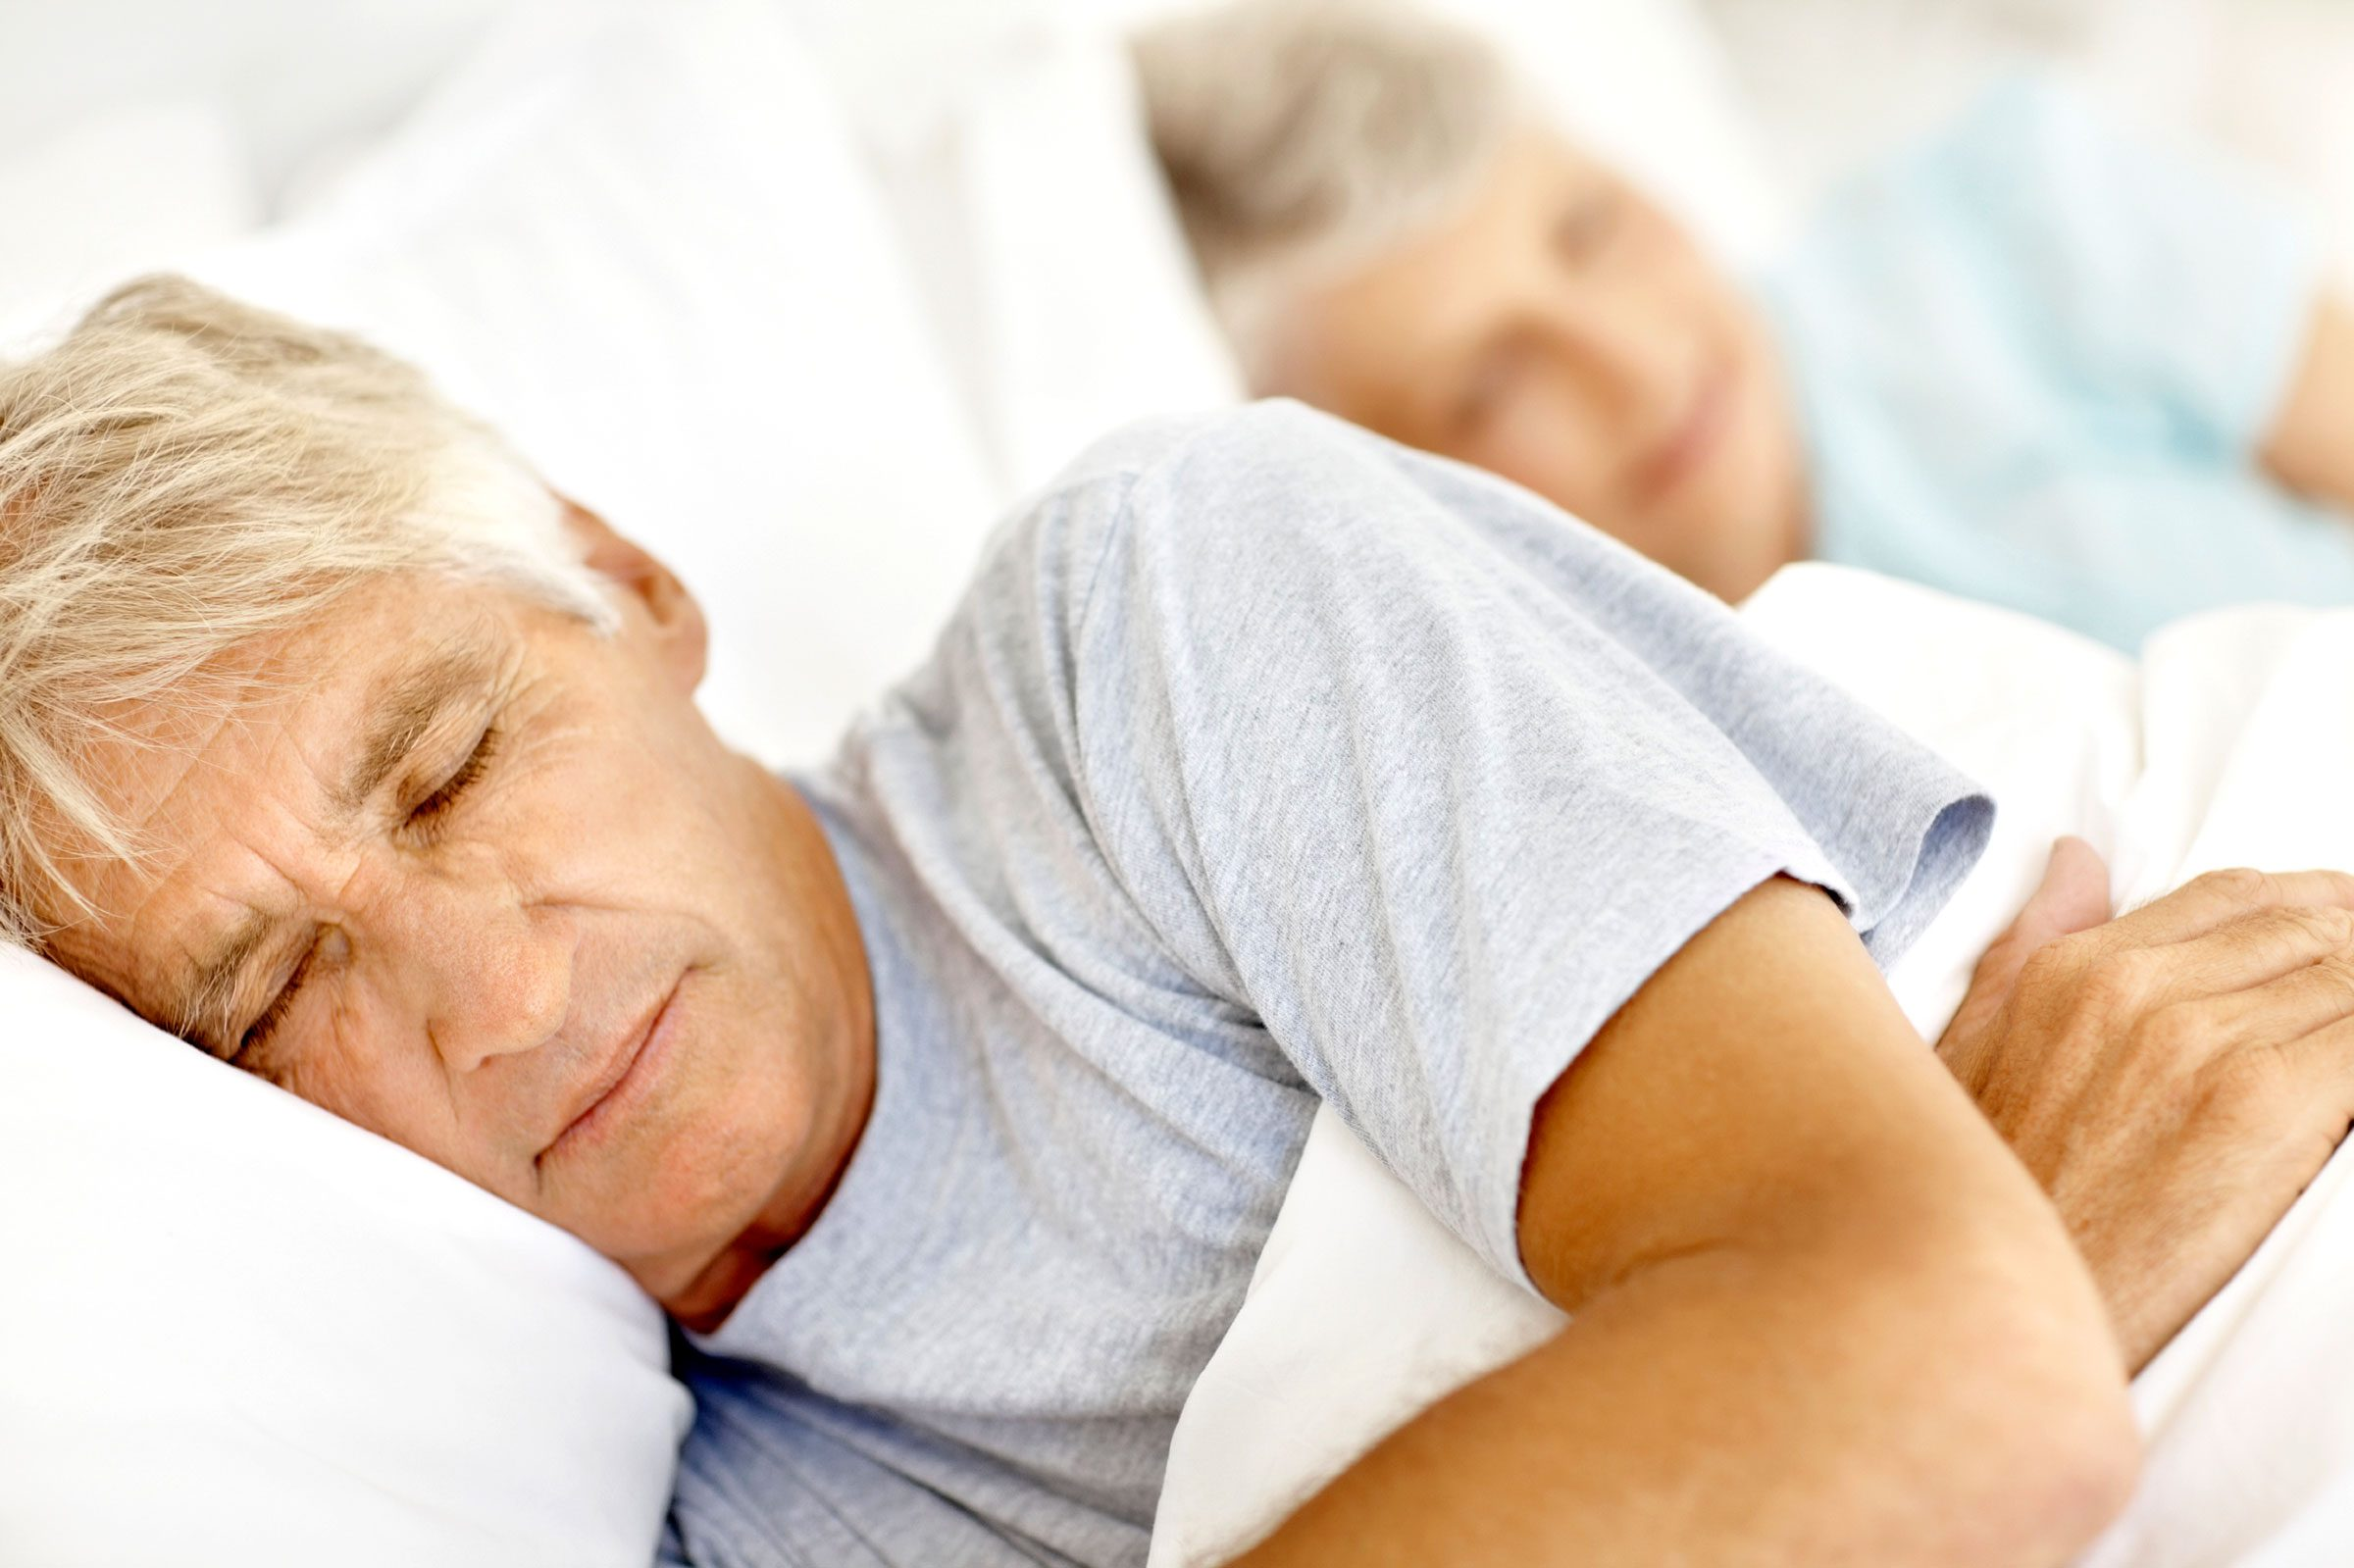 Sleep Doctors Debunk Myths About Sleep | Reader's Digest